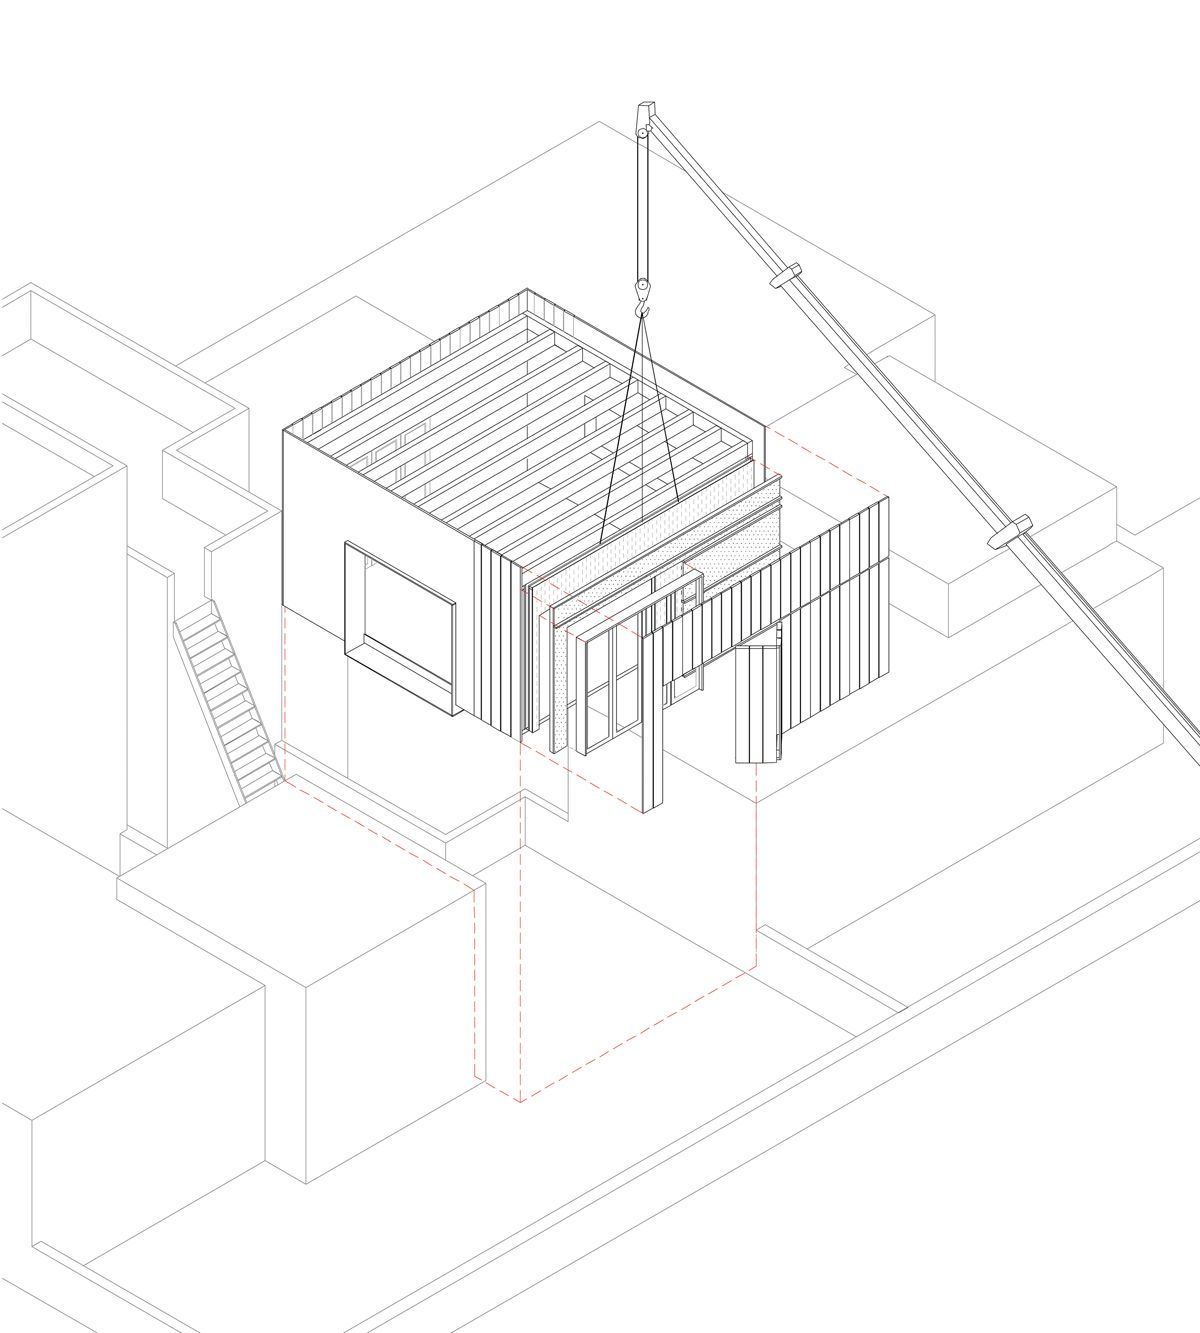 Penthouse Extension